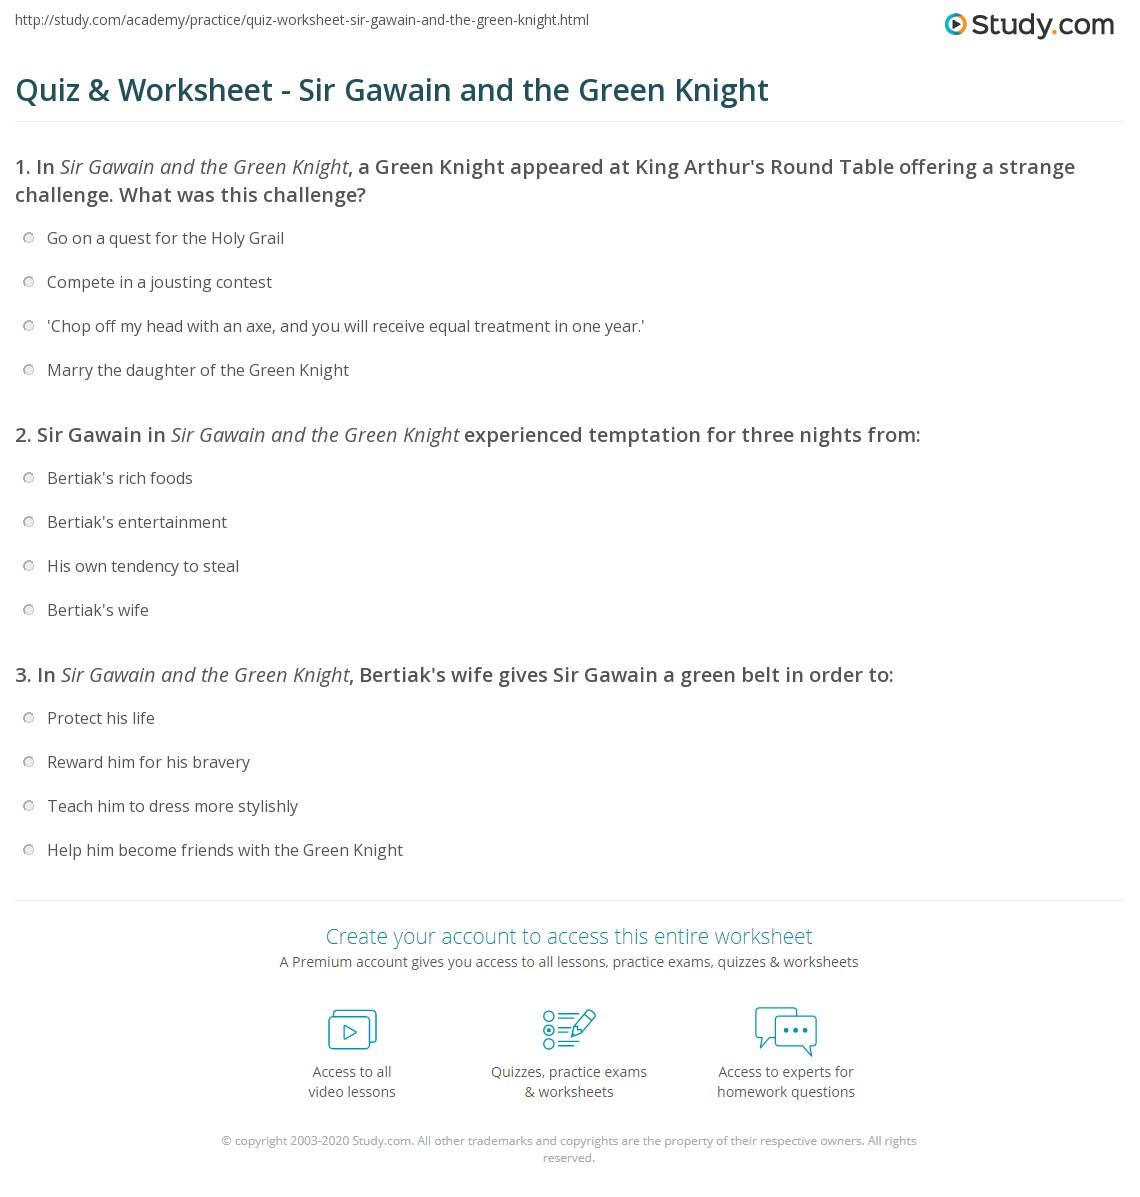 Quiz & Worksheet - Sir Gawain and the Green Knight | Study.com